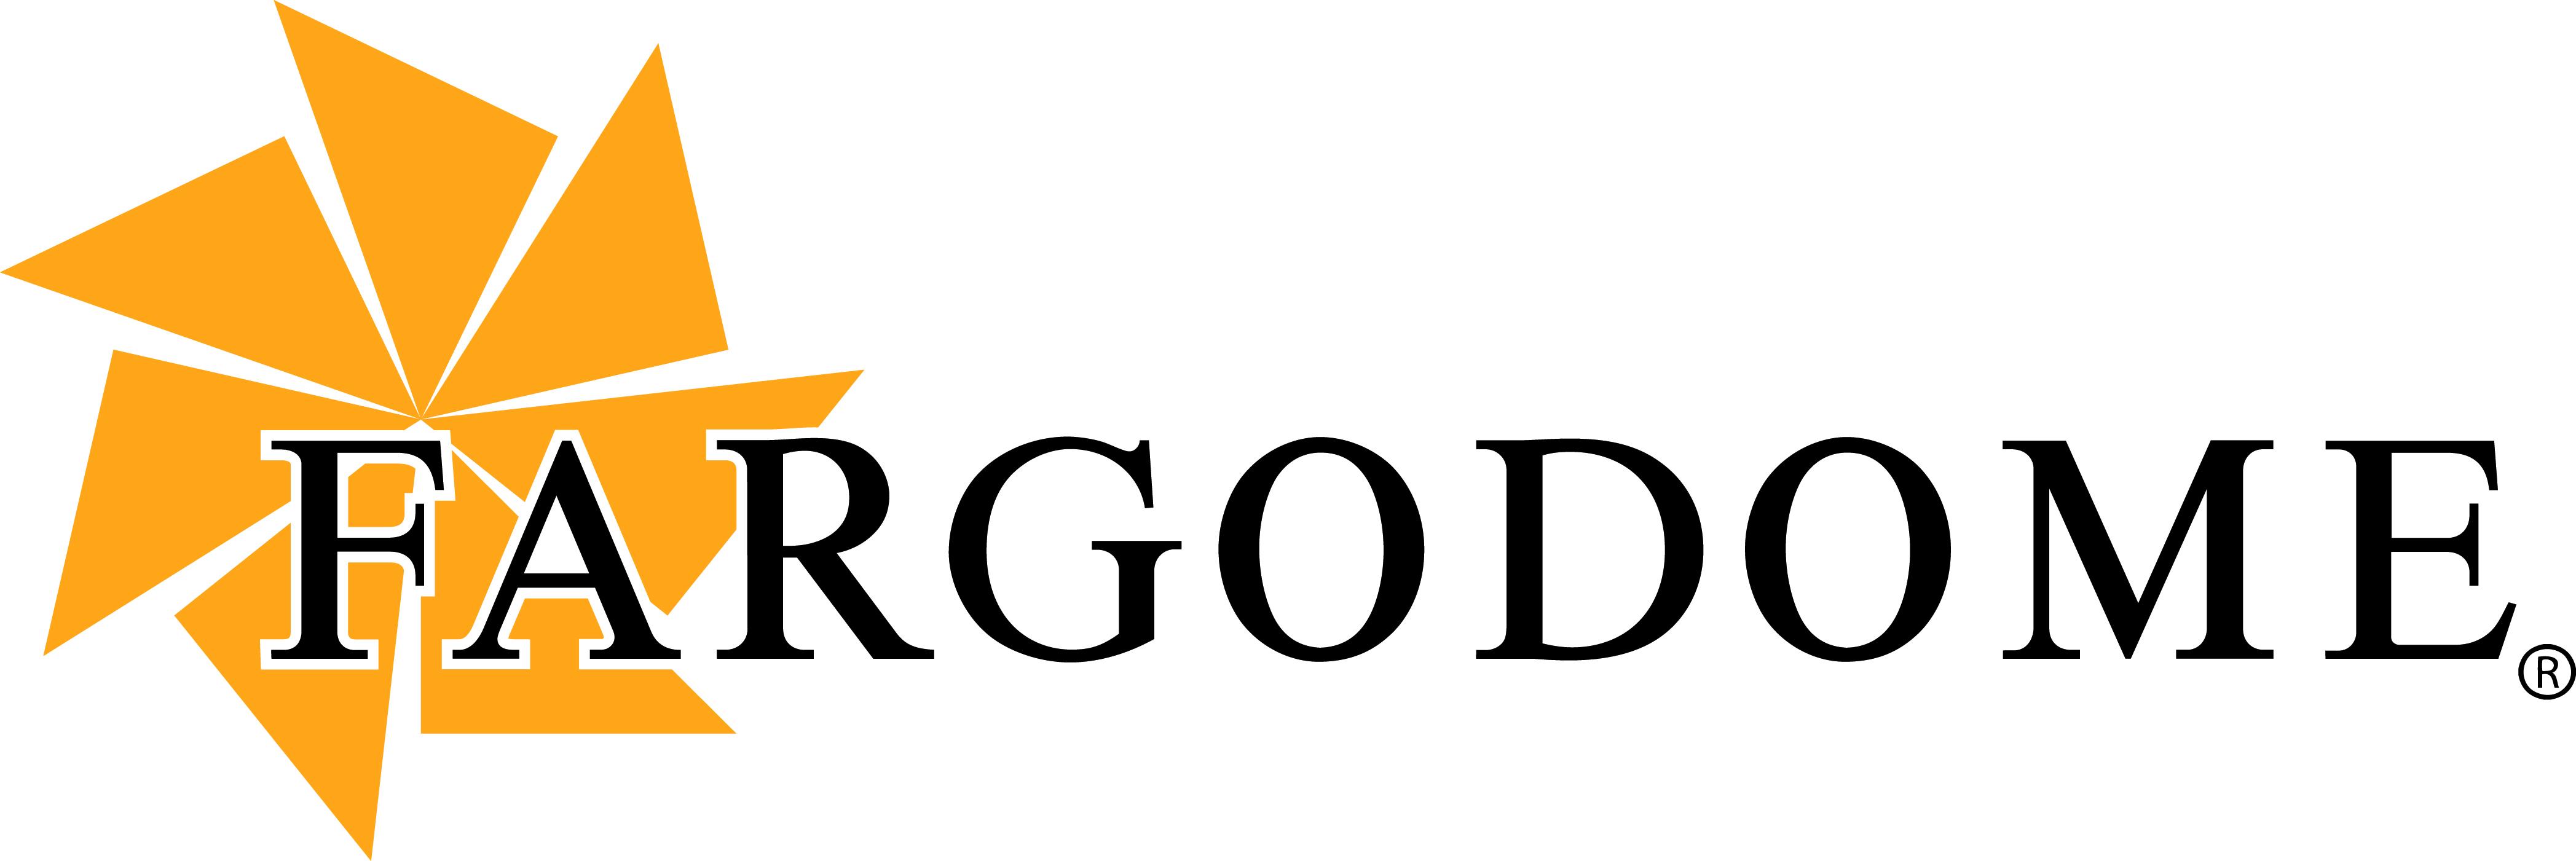 FARGODOME Trademark